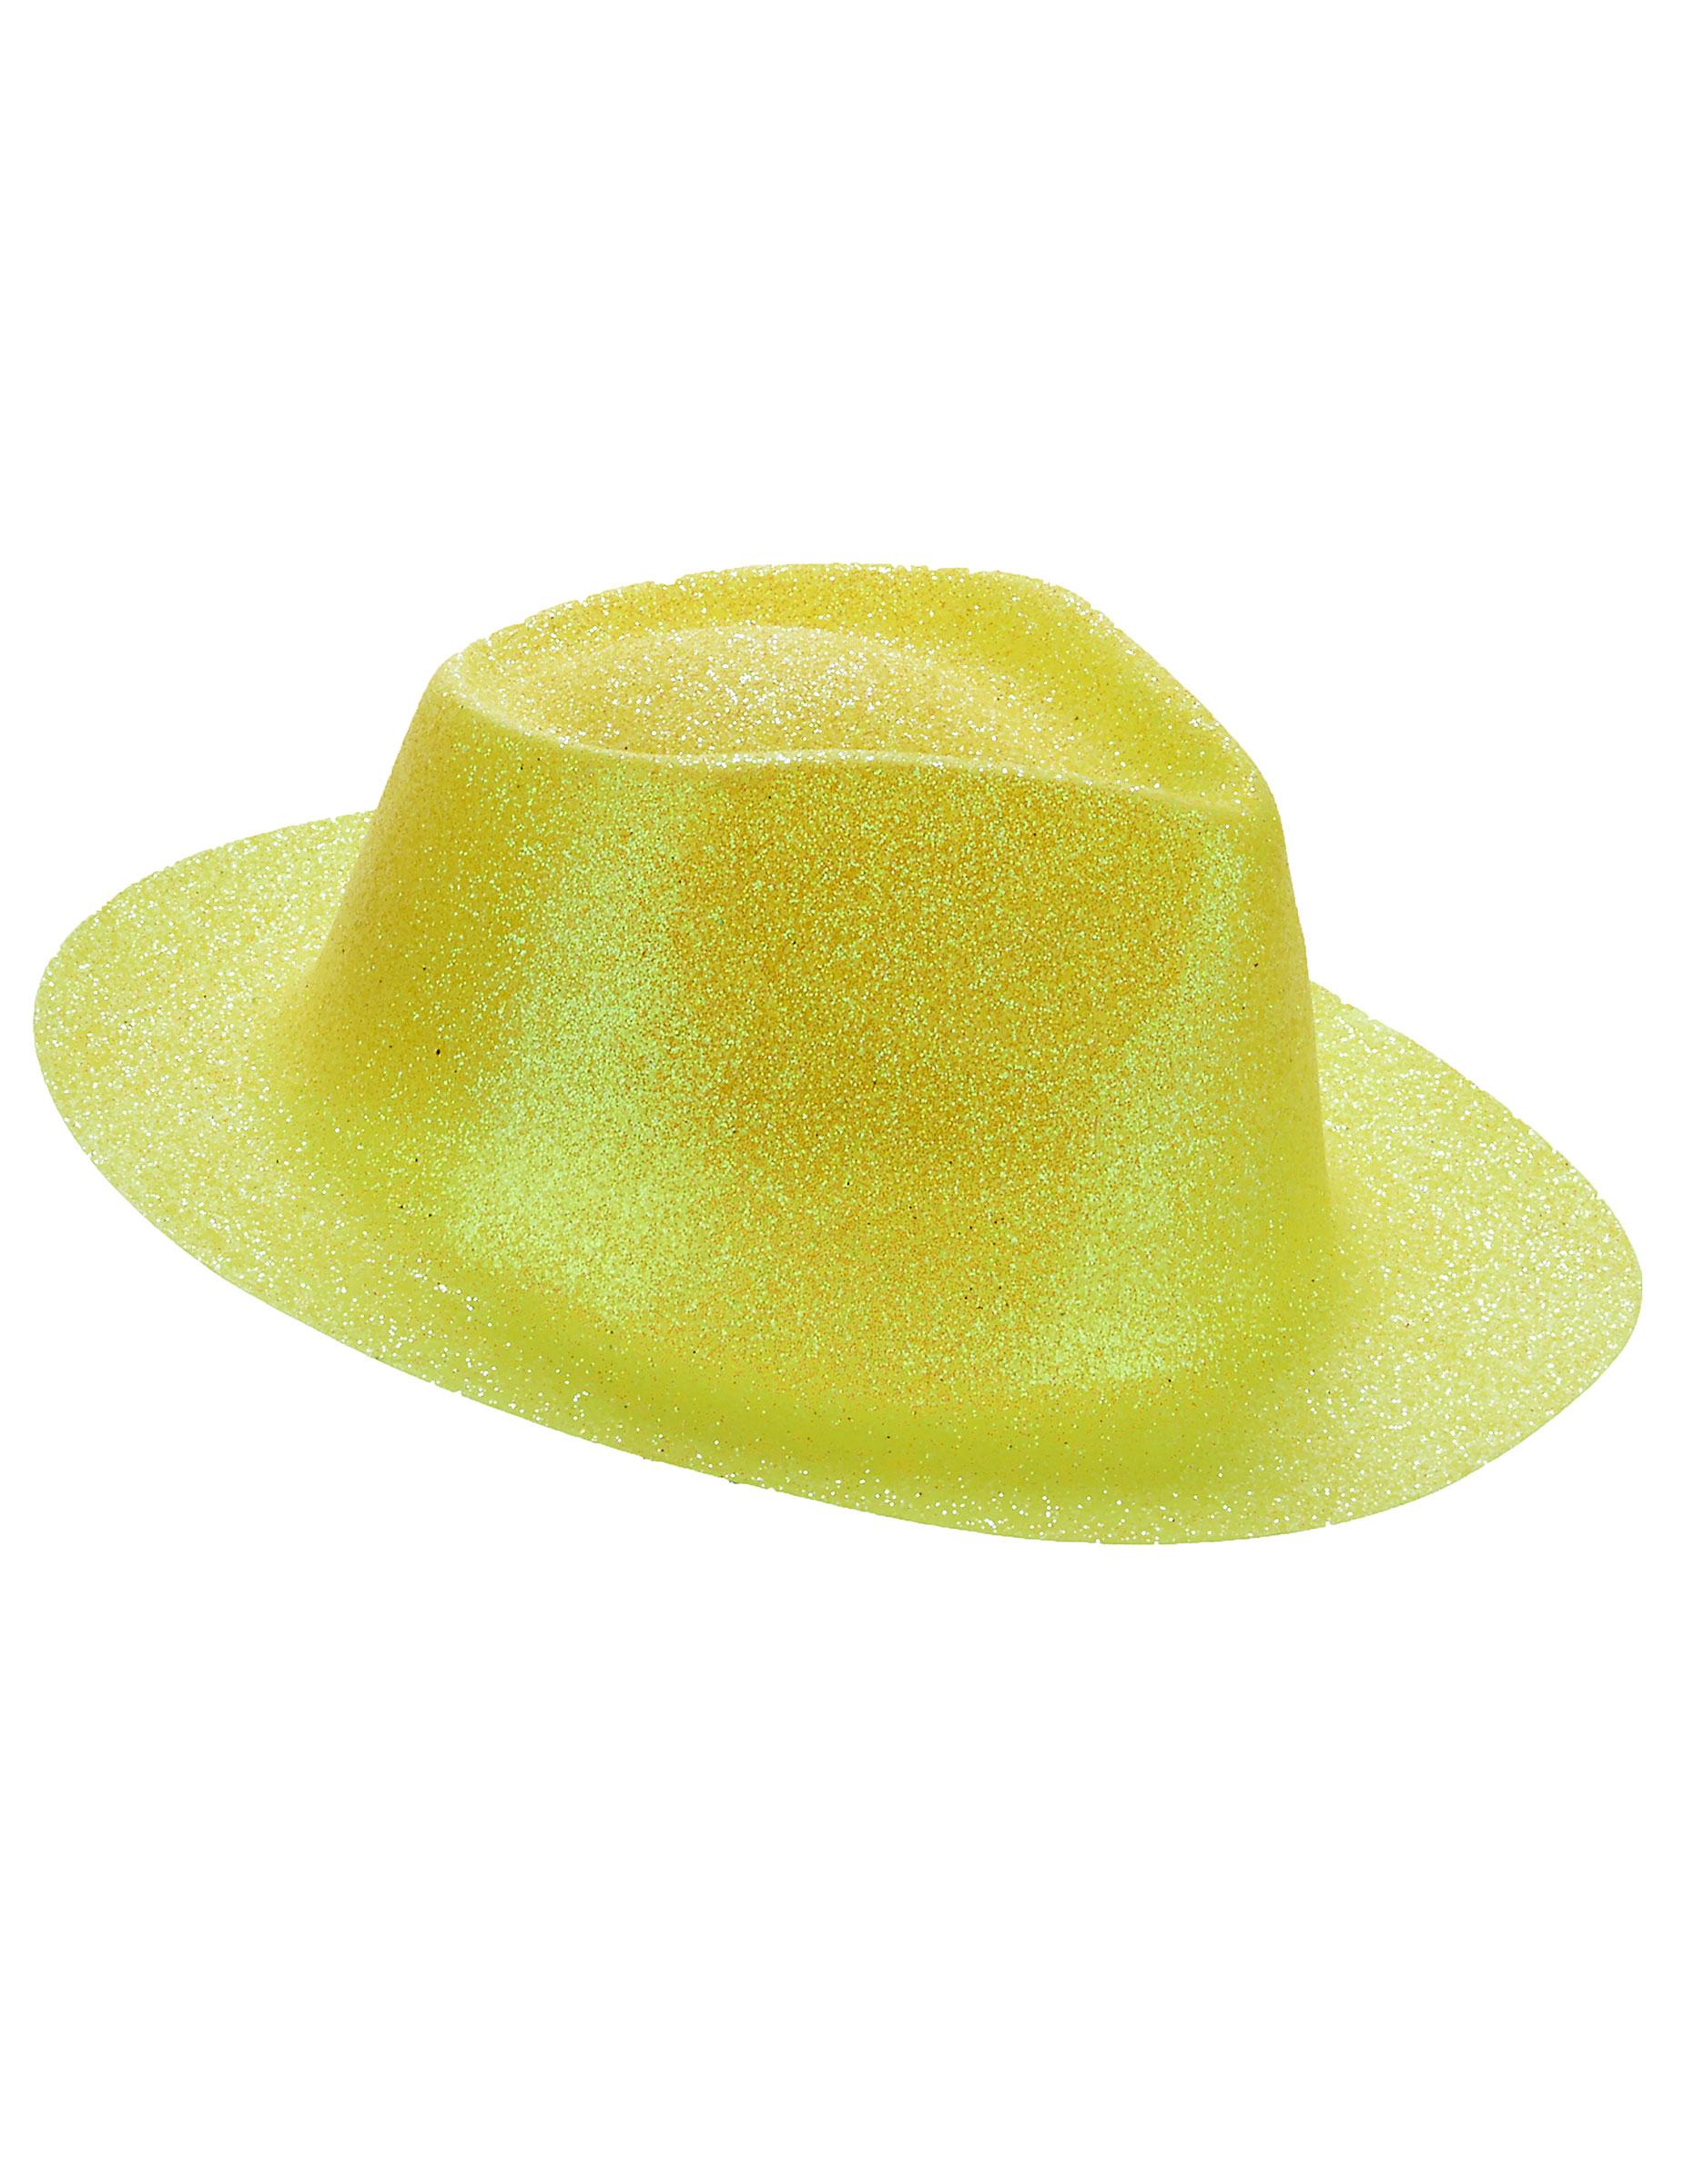 Sombrero purpurina amarilla adulto  Sombreros b34081ac89b